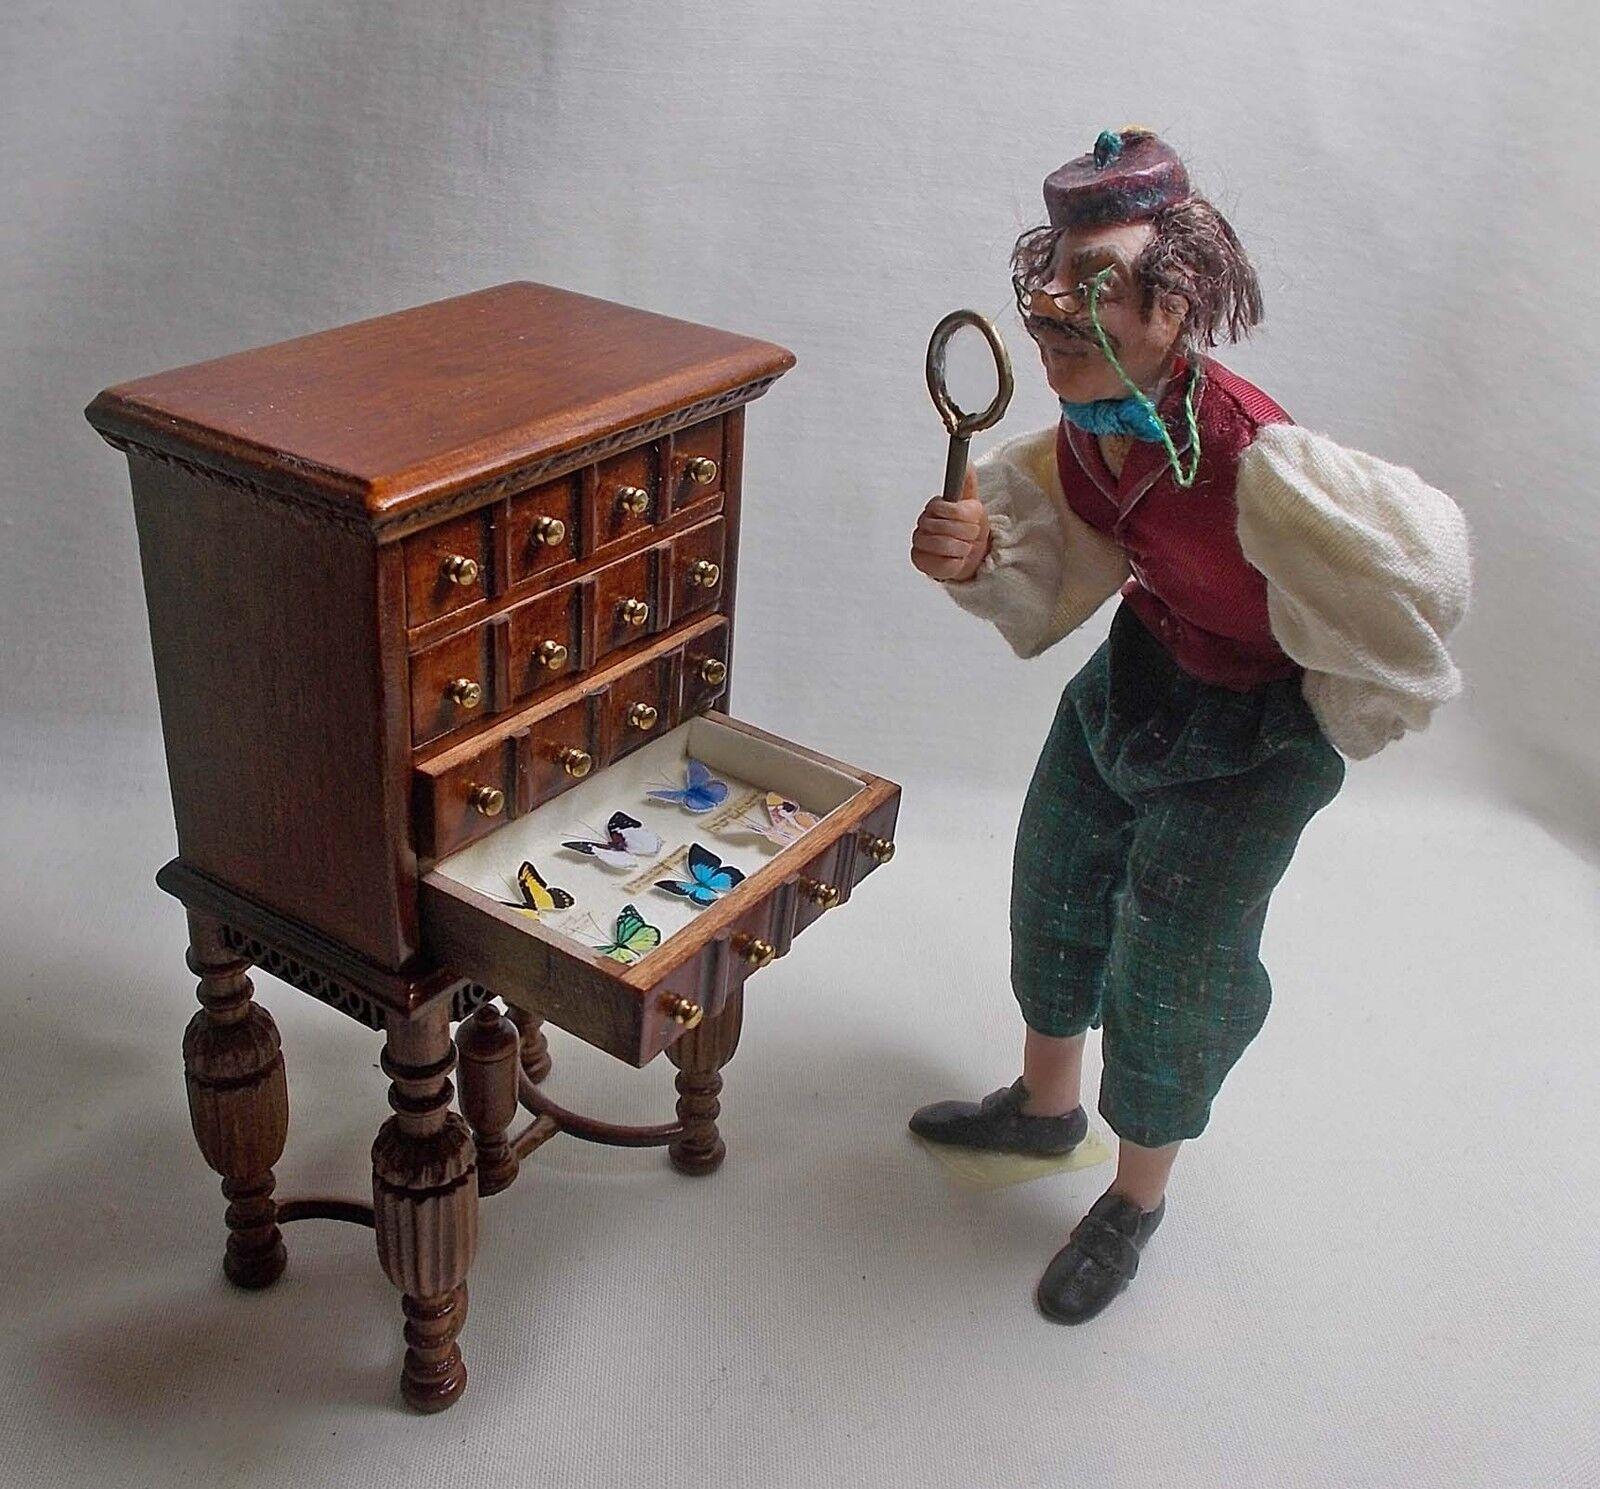 La maison de poupées miniature BESPAQ BESPAQ BESPAQ 4 tiroirs petit en bois Lepidoptera/COLLECTOR e17e74